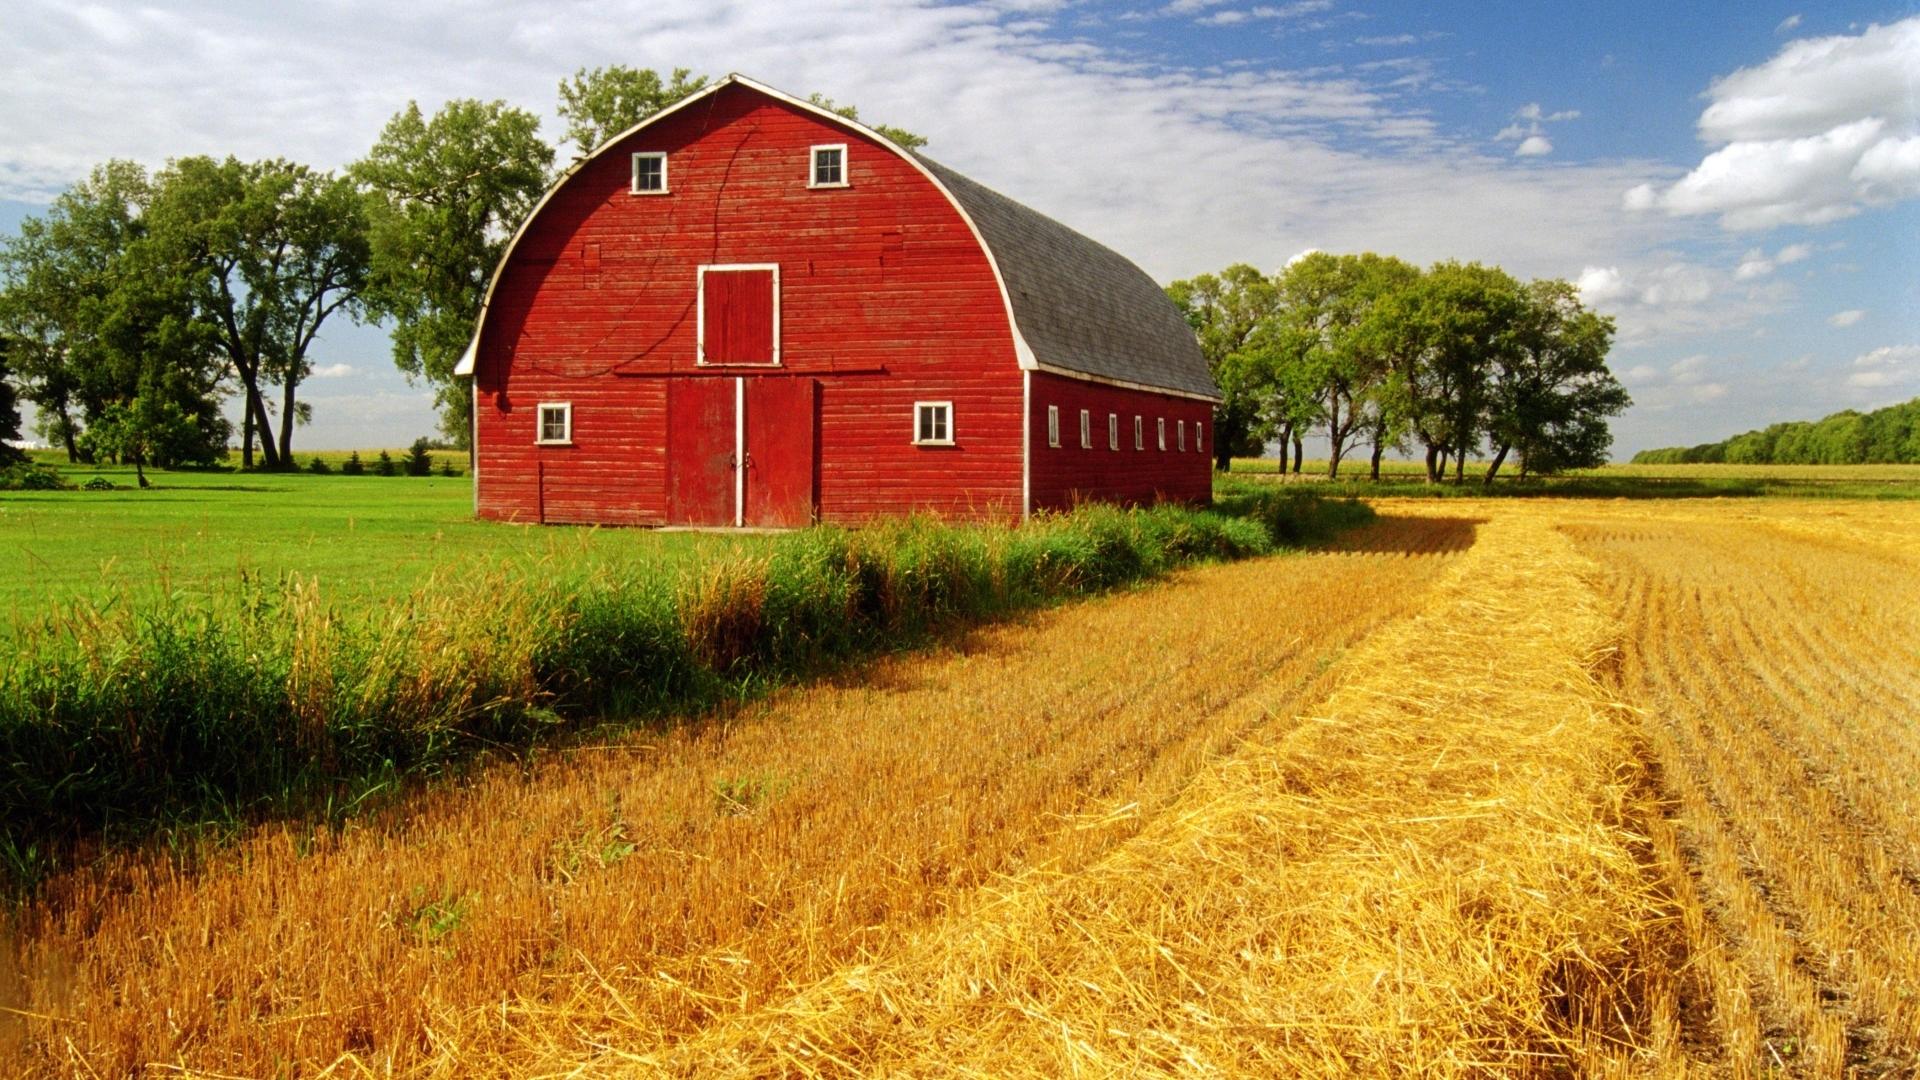 Farm Backgrounds and Wallpaper - WallpaperSafari